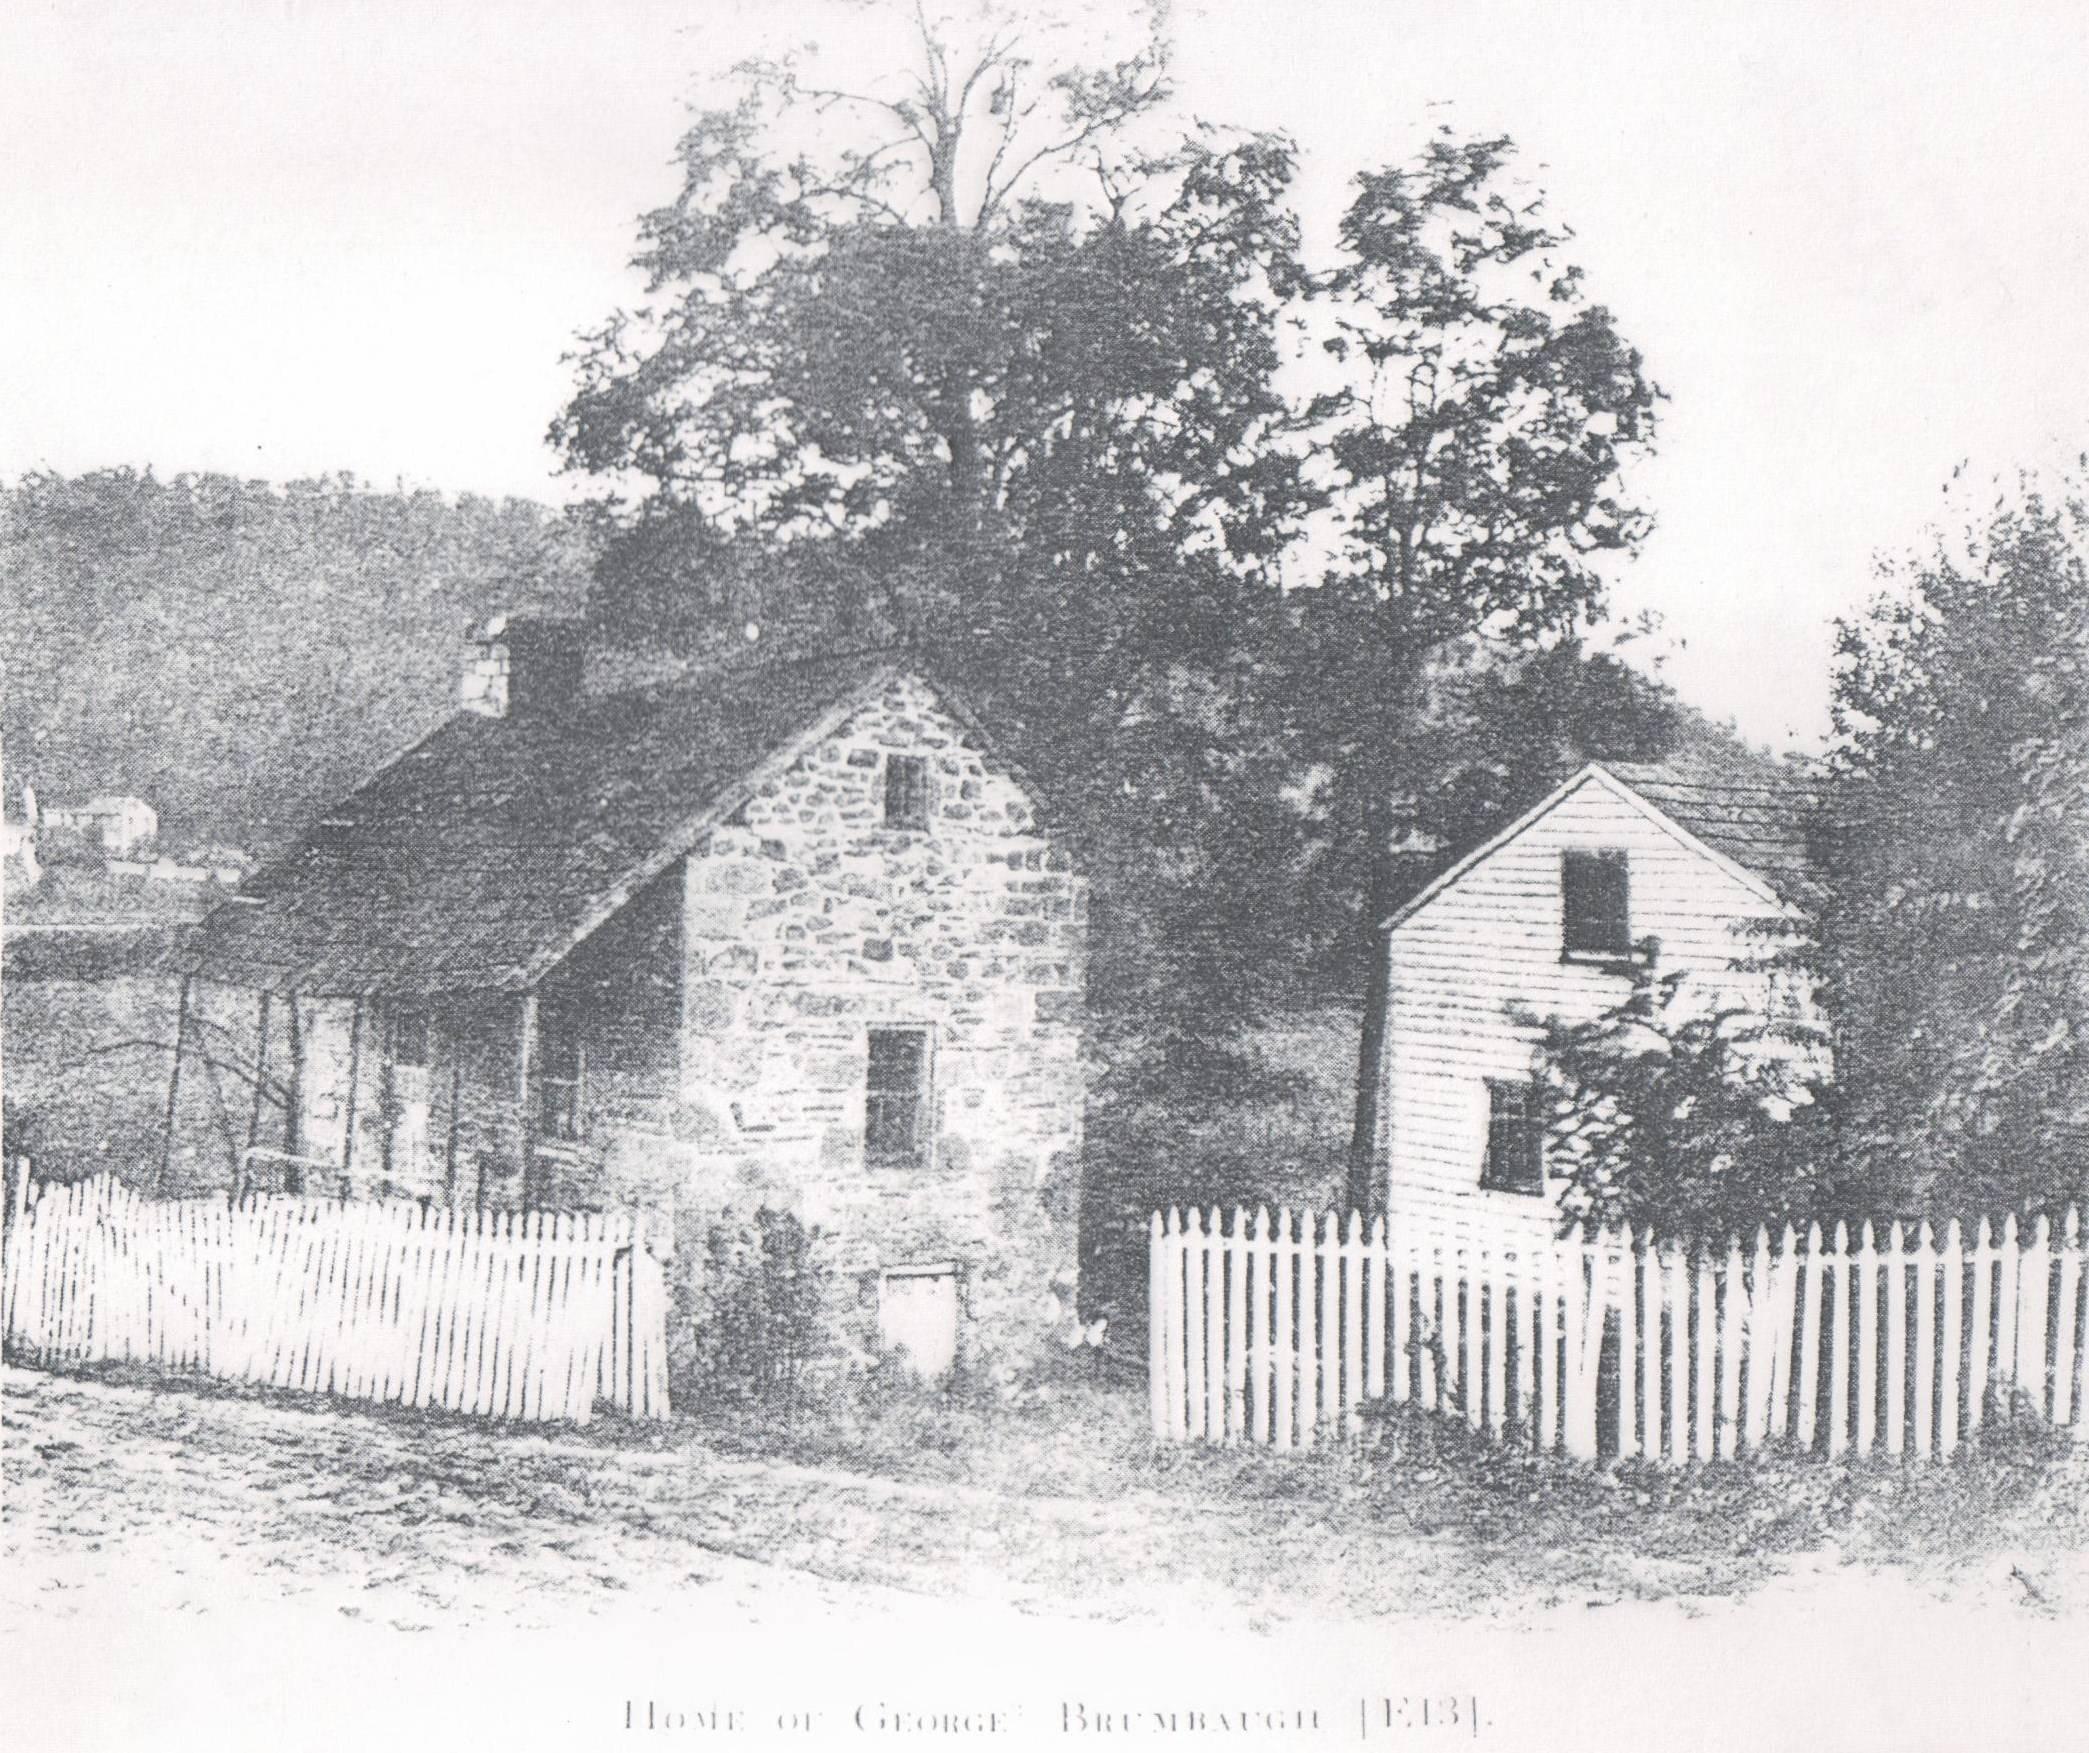 Original Brumbaugh House